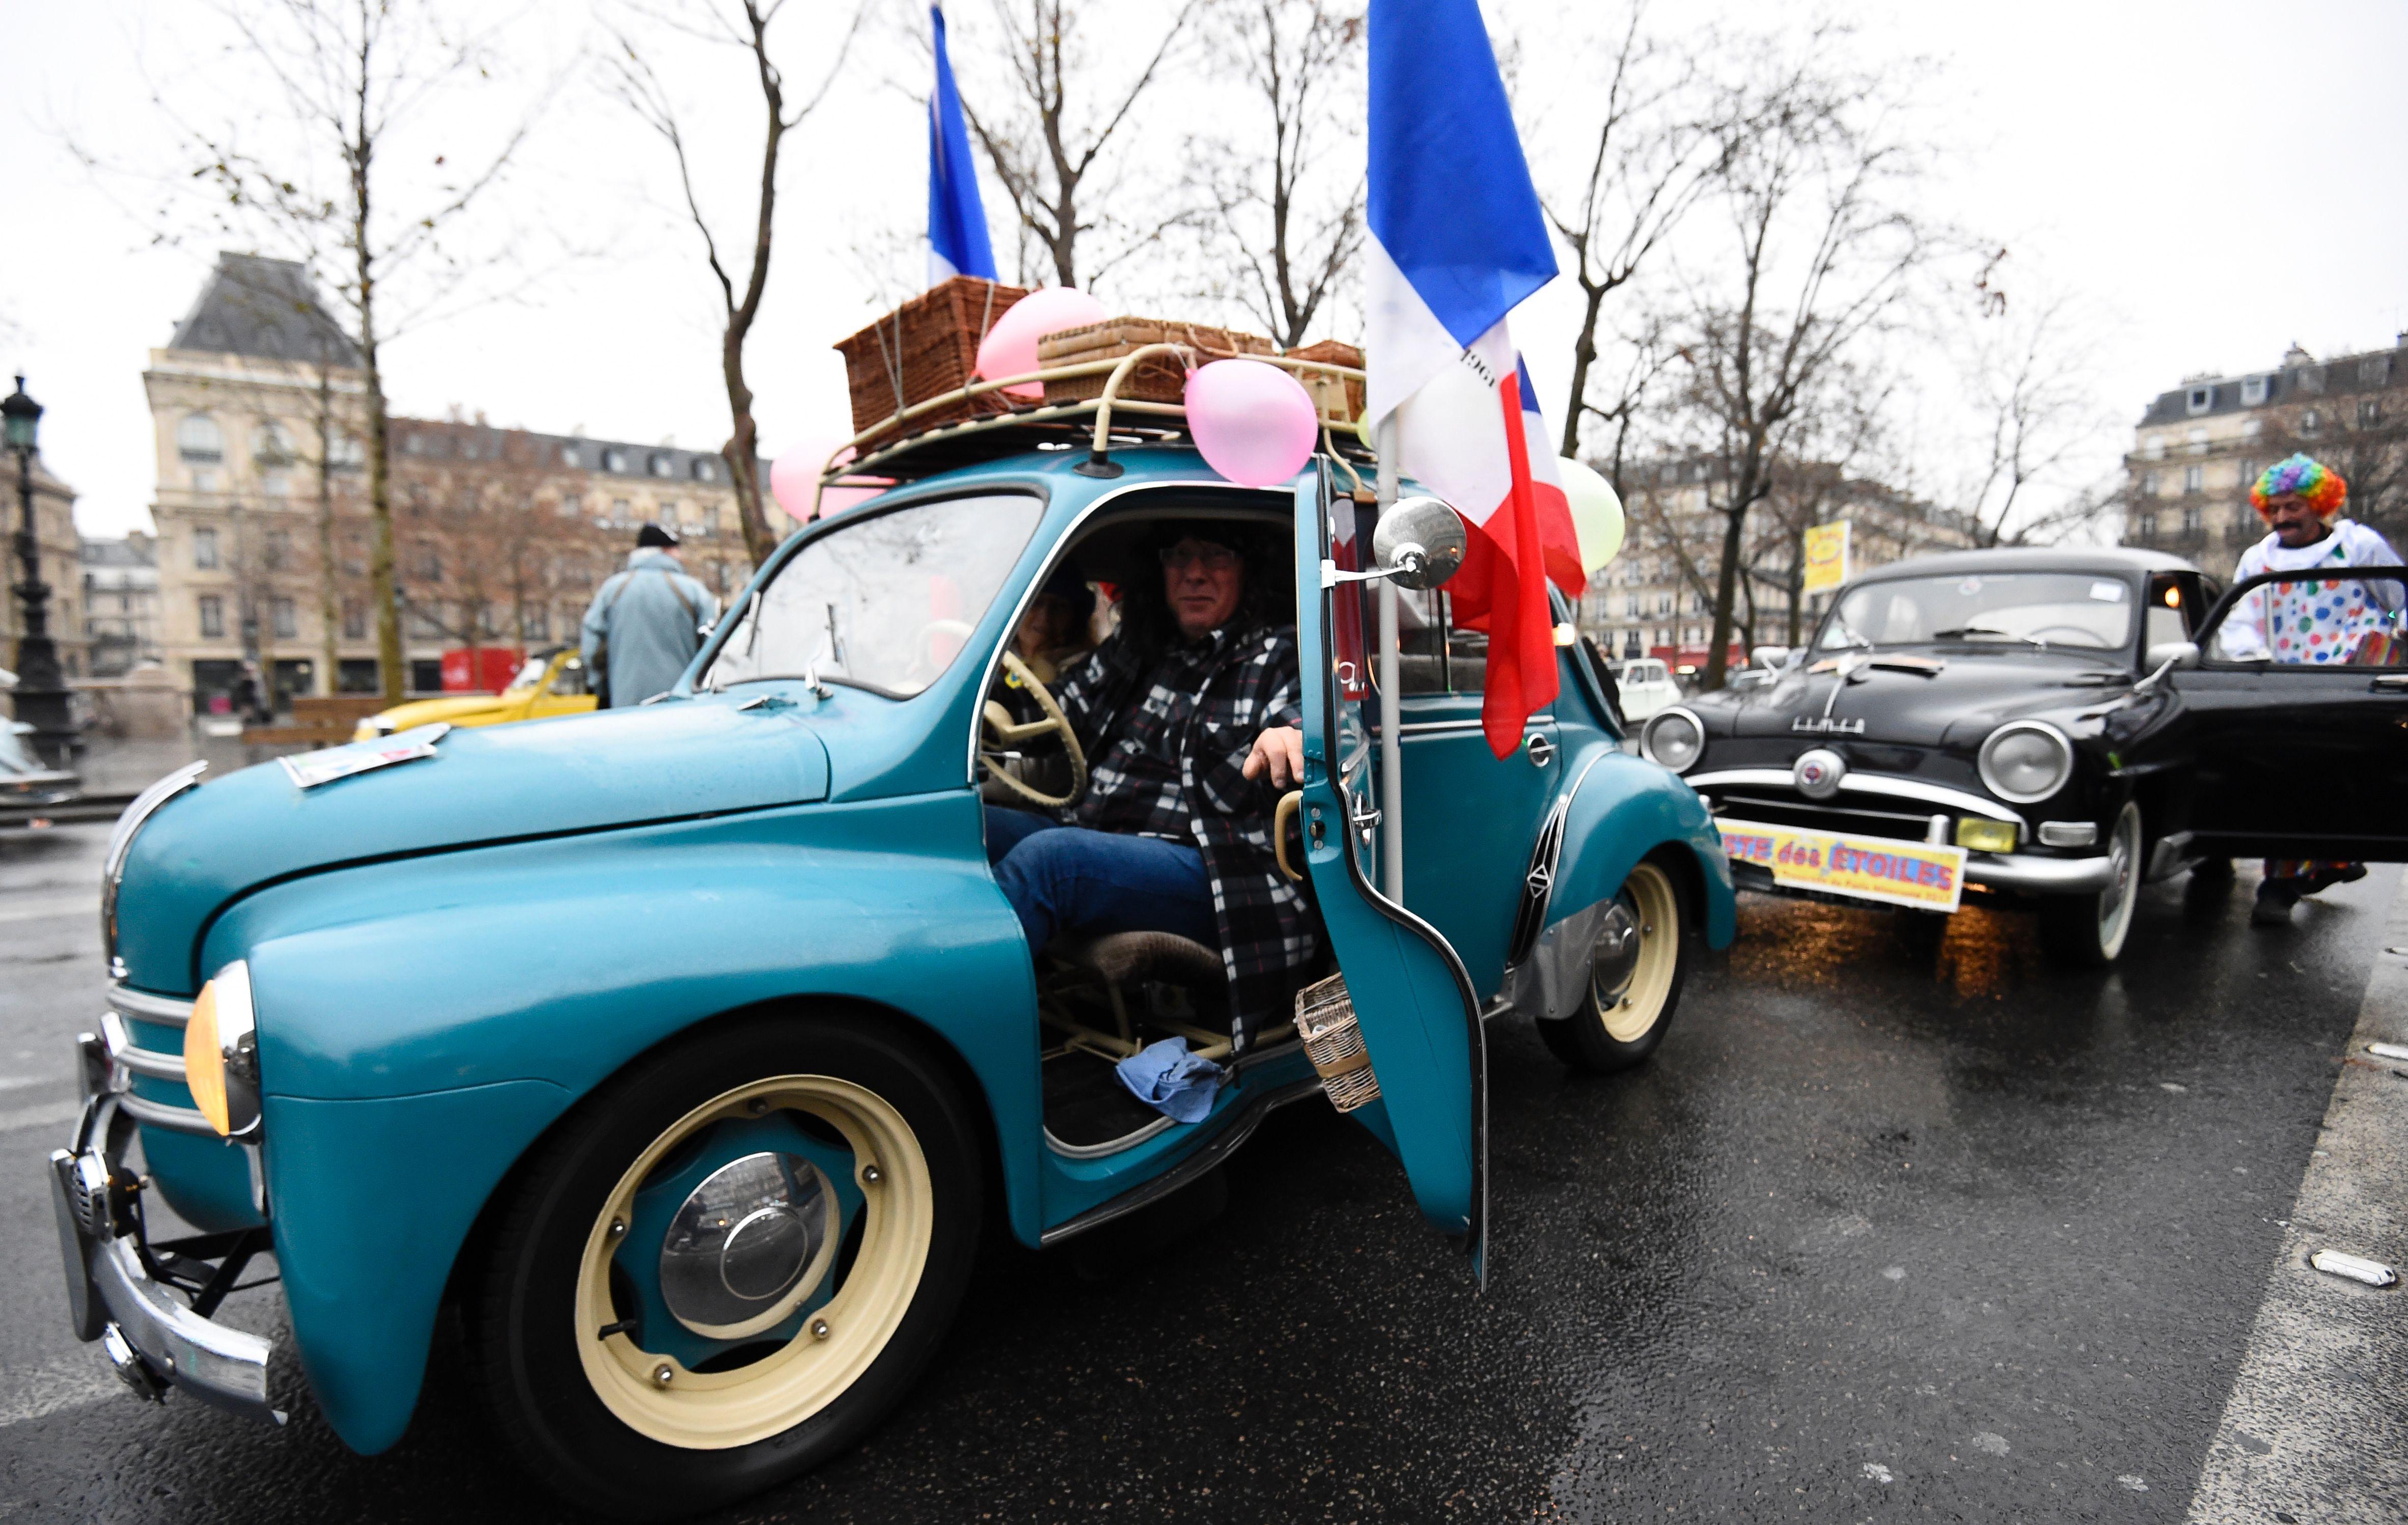 FRANCE-TOURISM-VINTAGE-CAR-PARADE